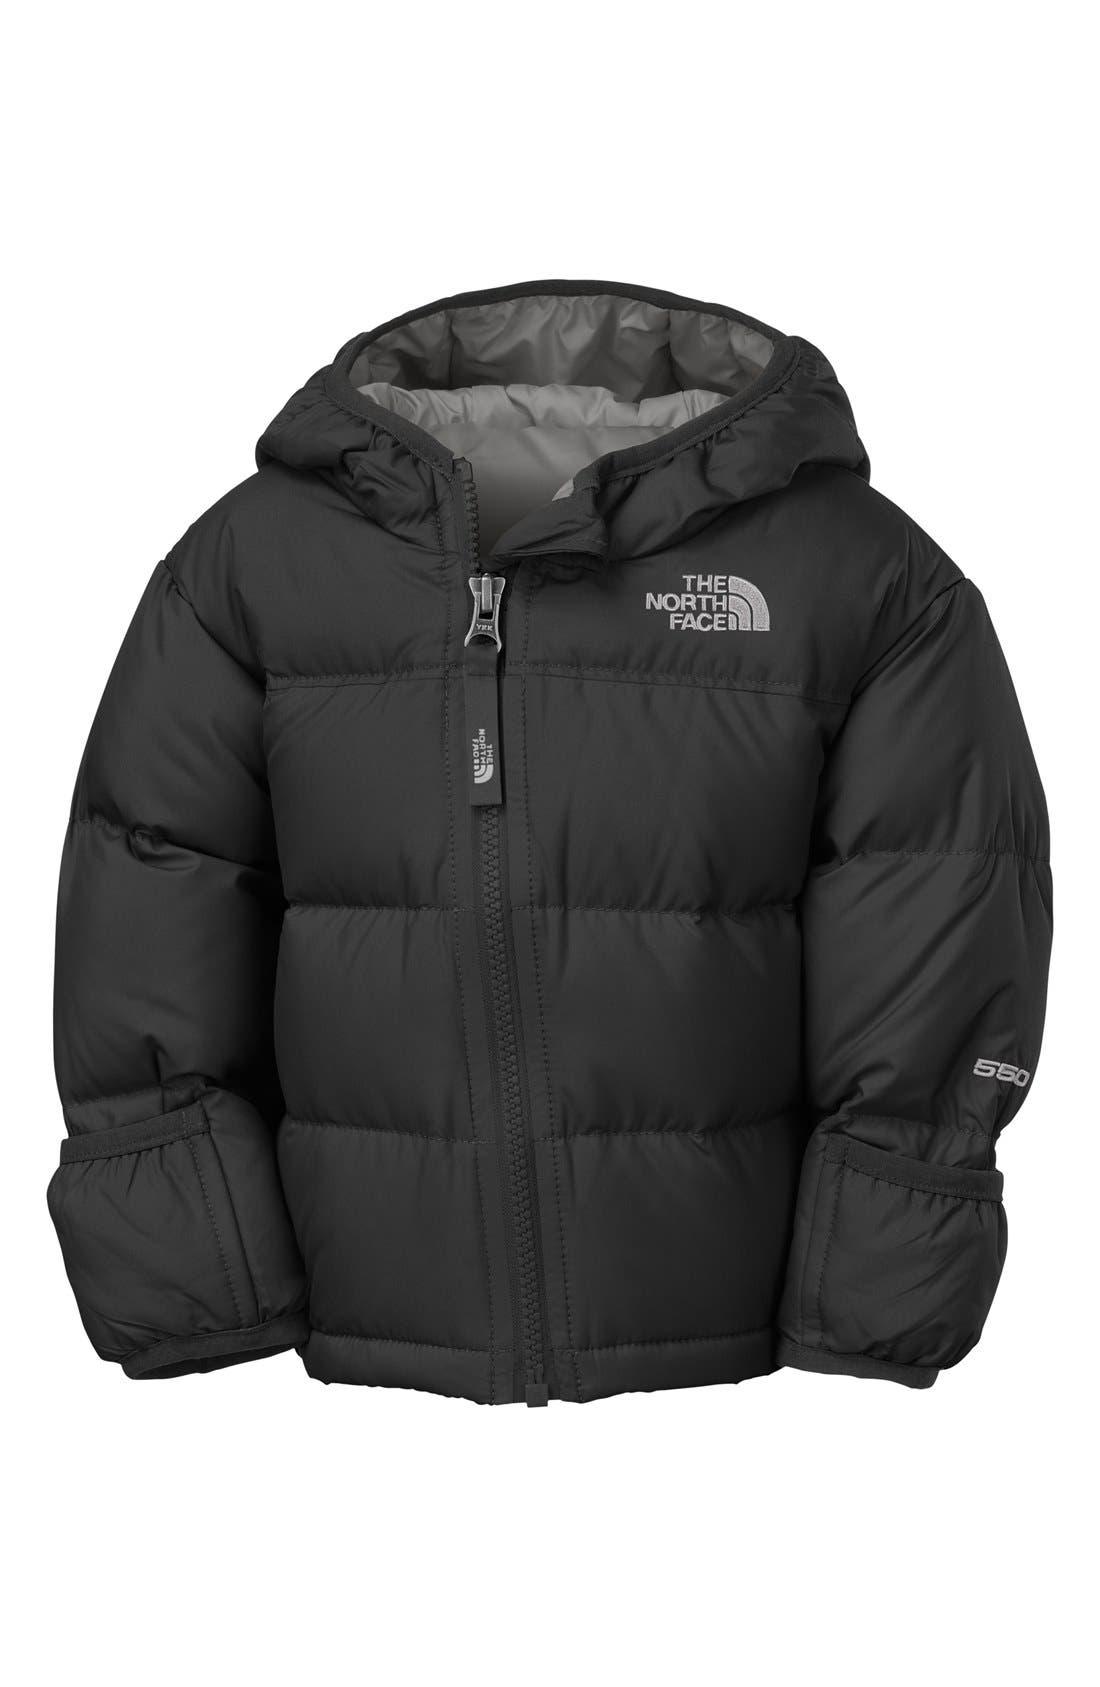 THE NORTH FACE 'Nuptse' Hooded Down Jacket, Main, color, 001